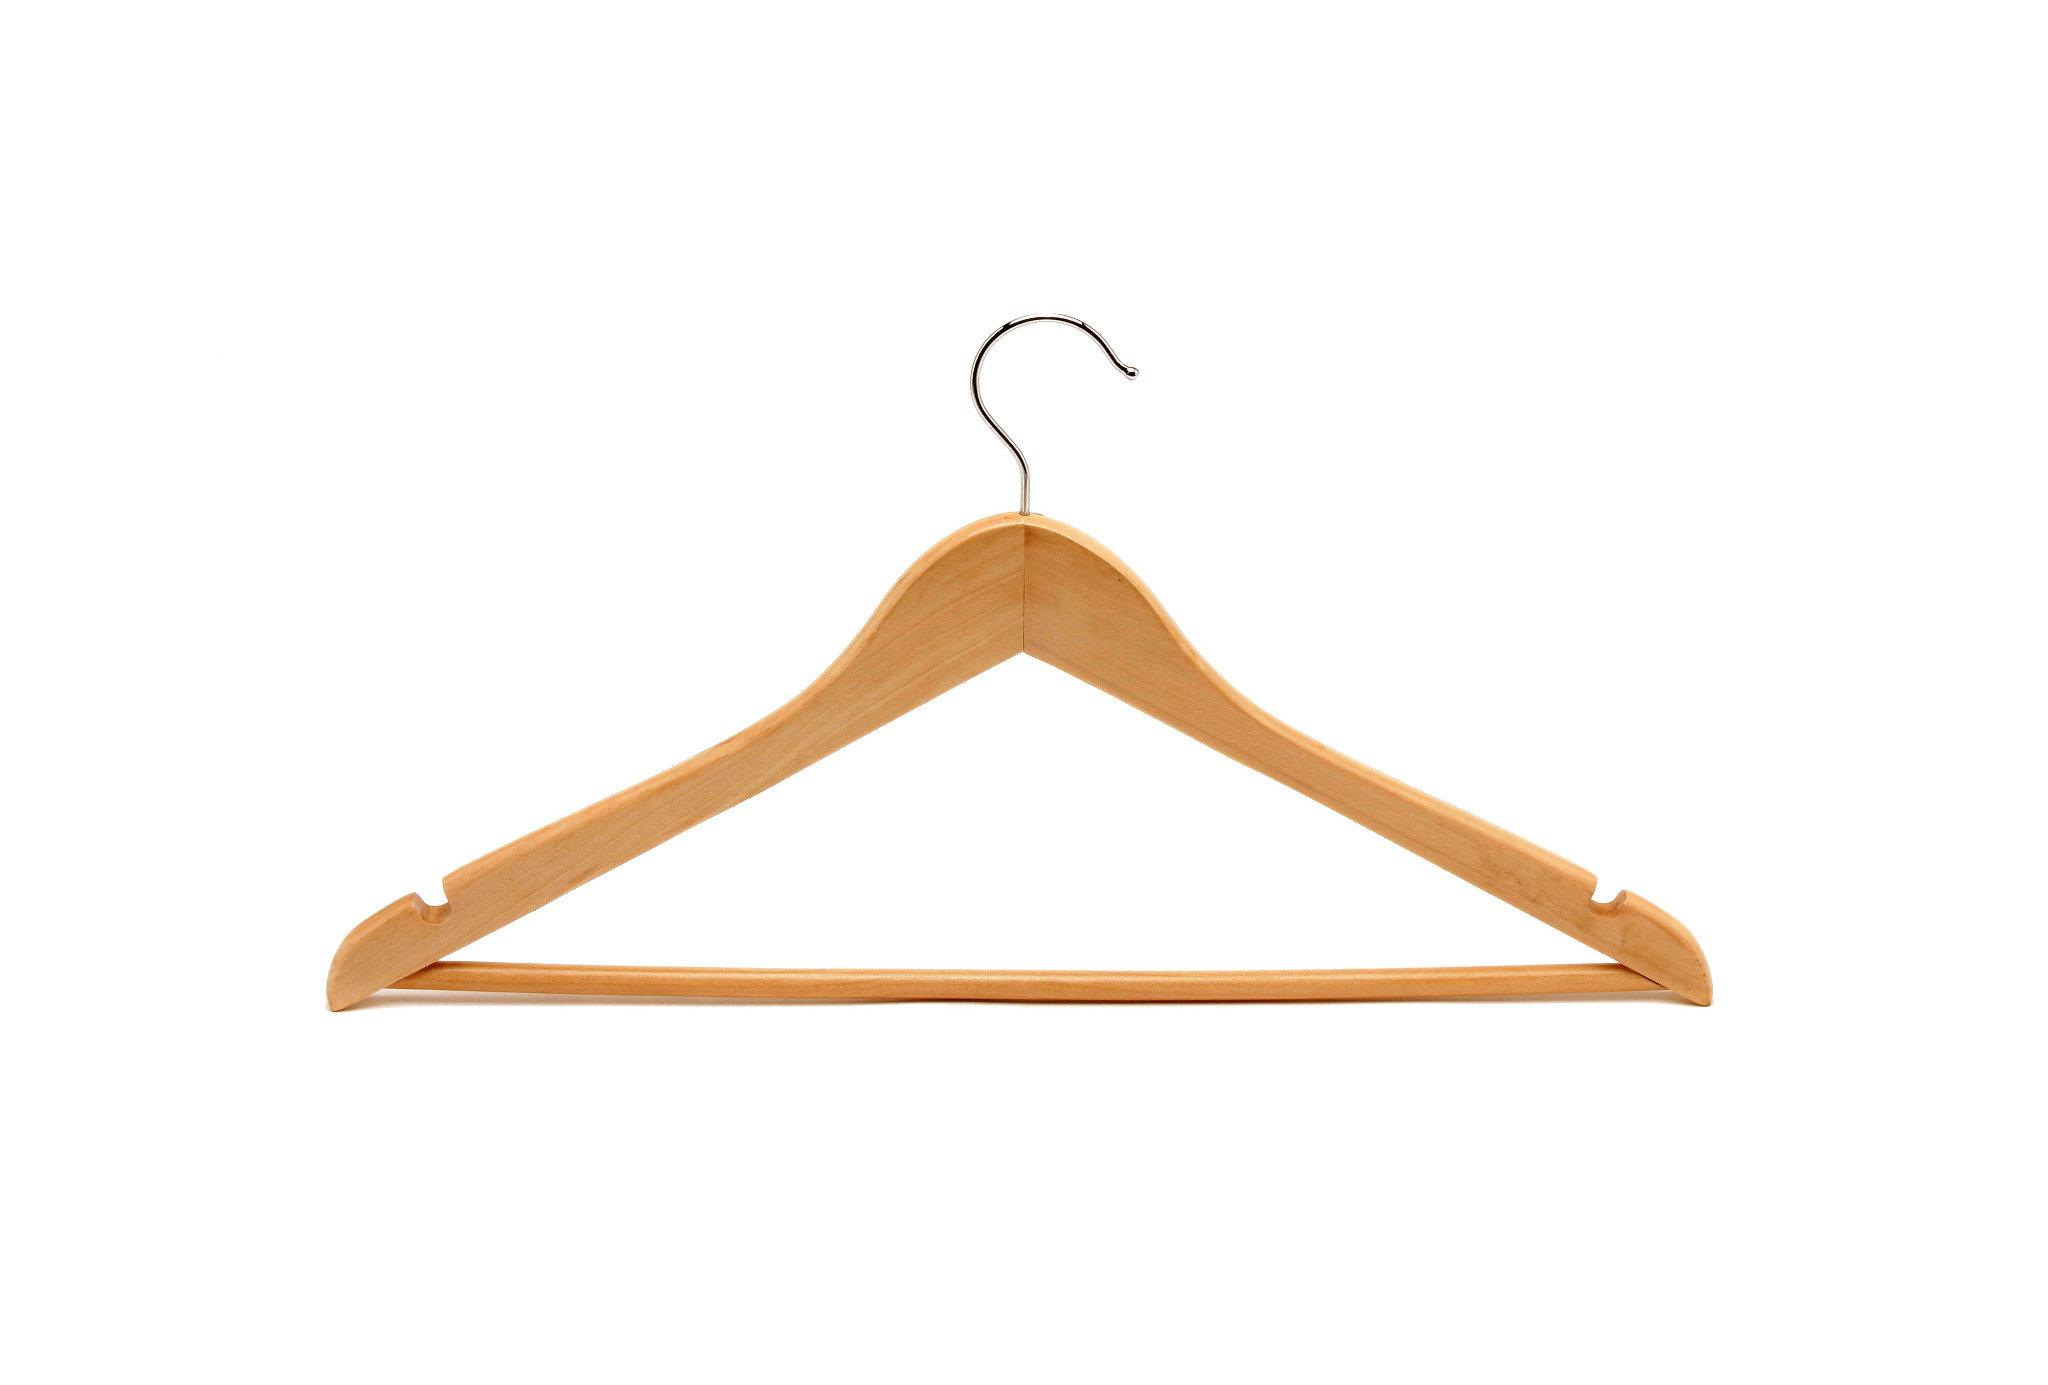 Standard Clothes Hanger